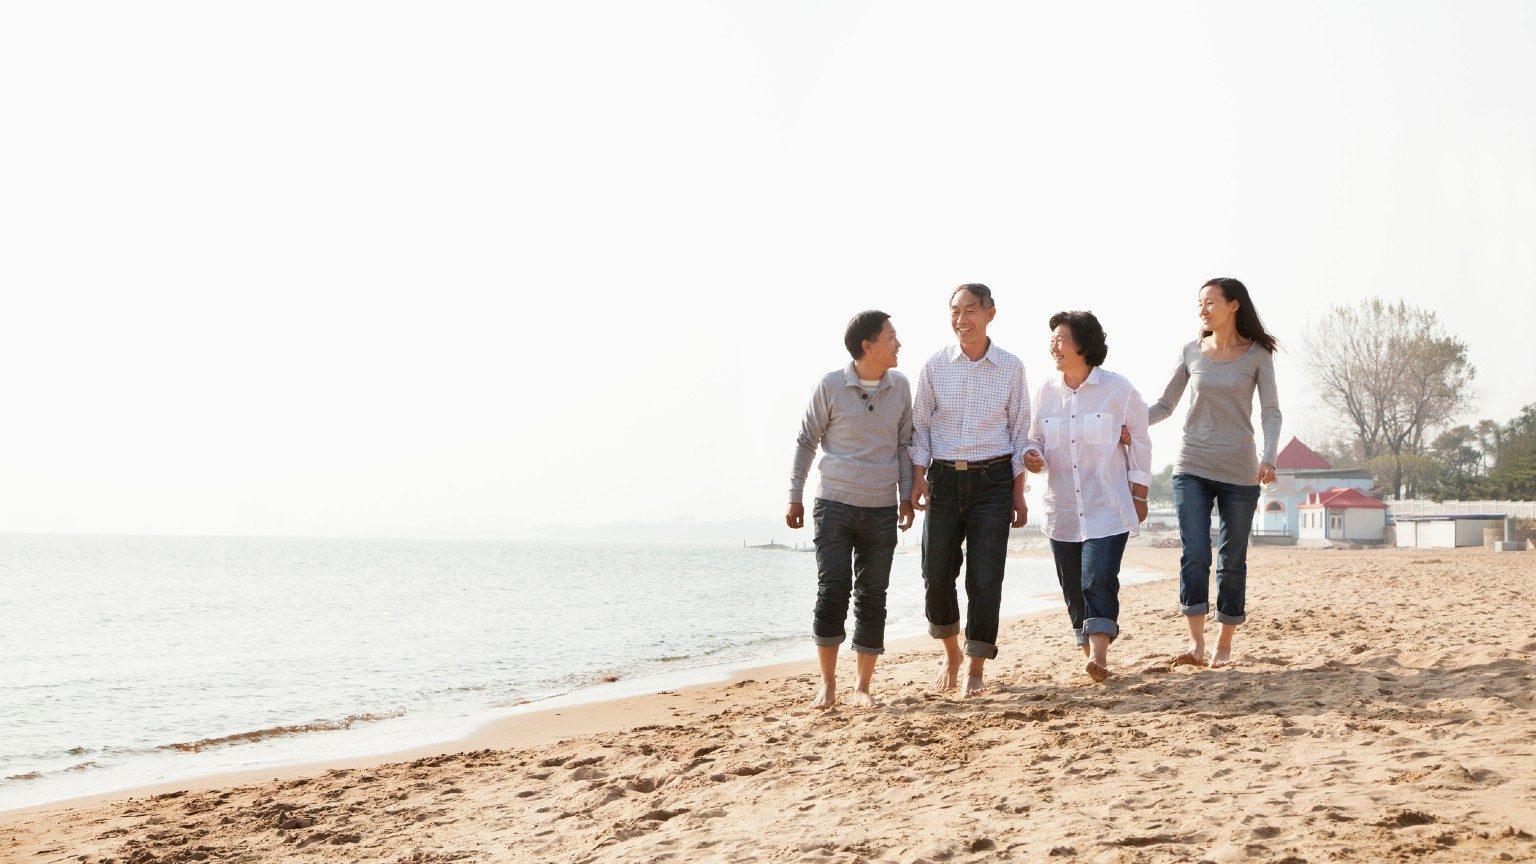 Multi-generational family walking on the beach.